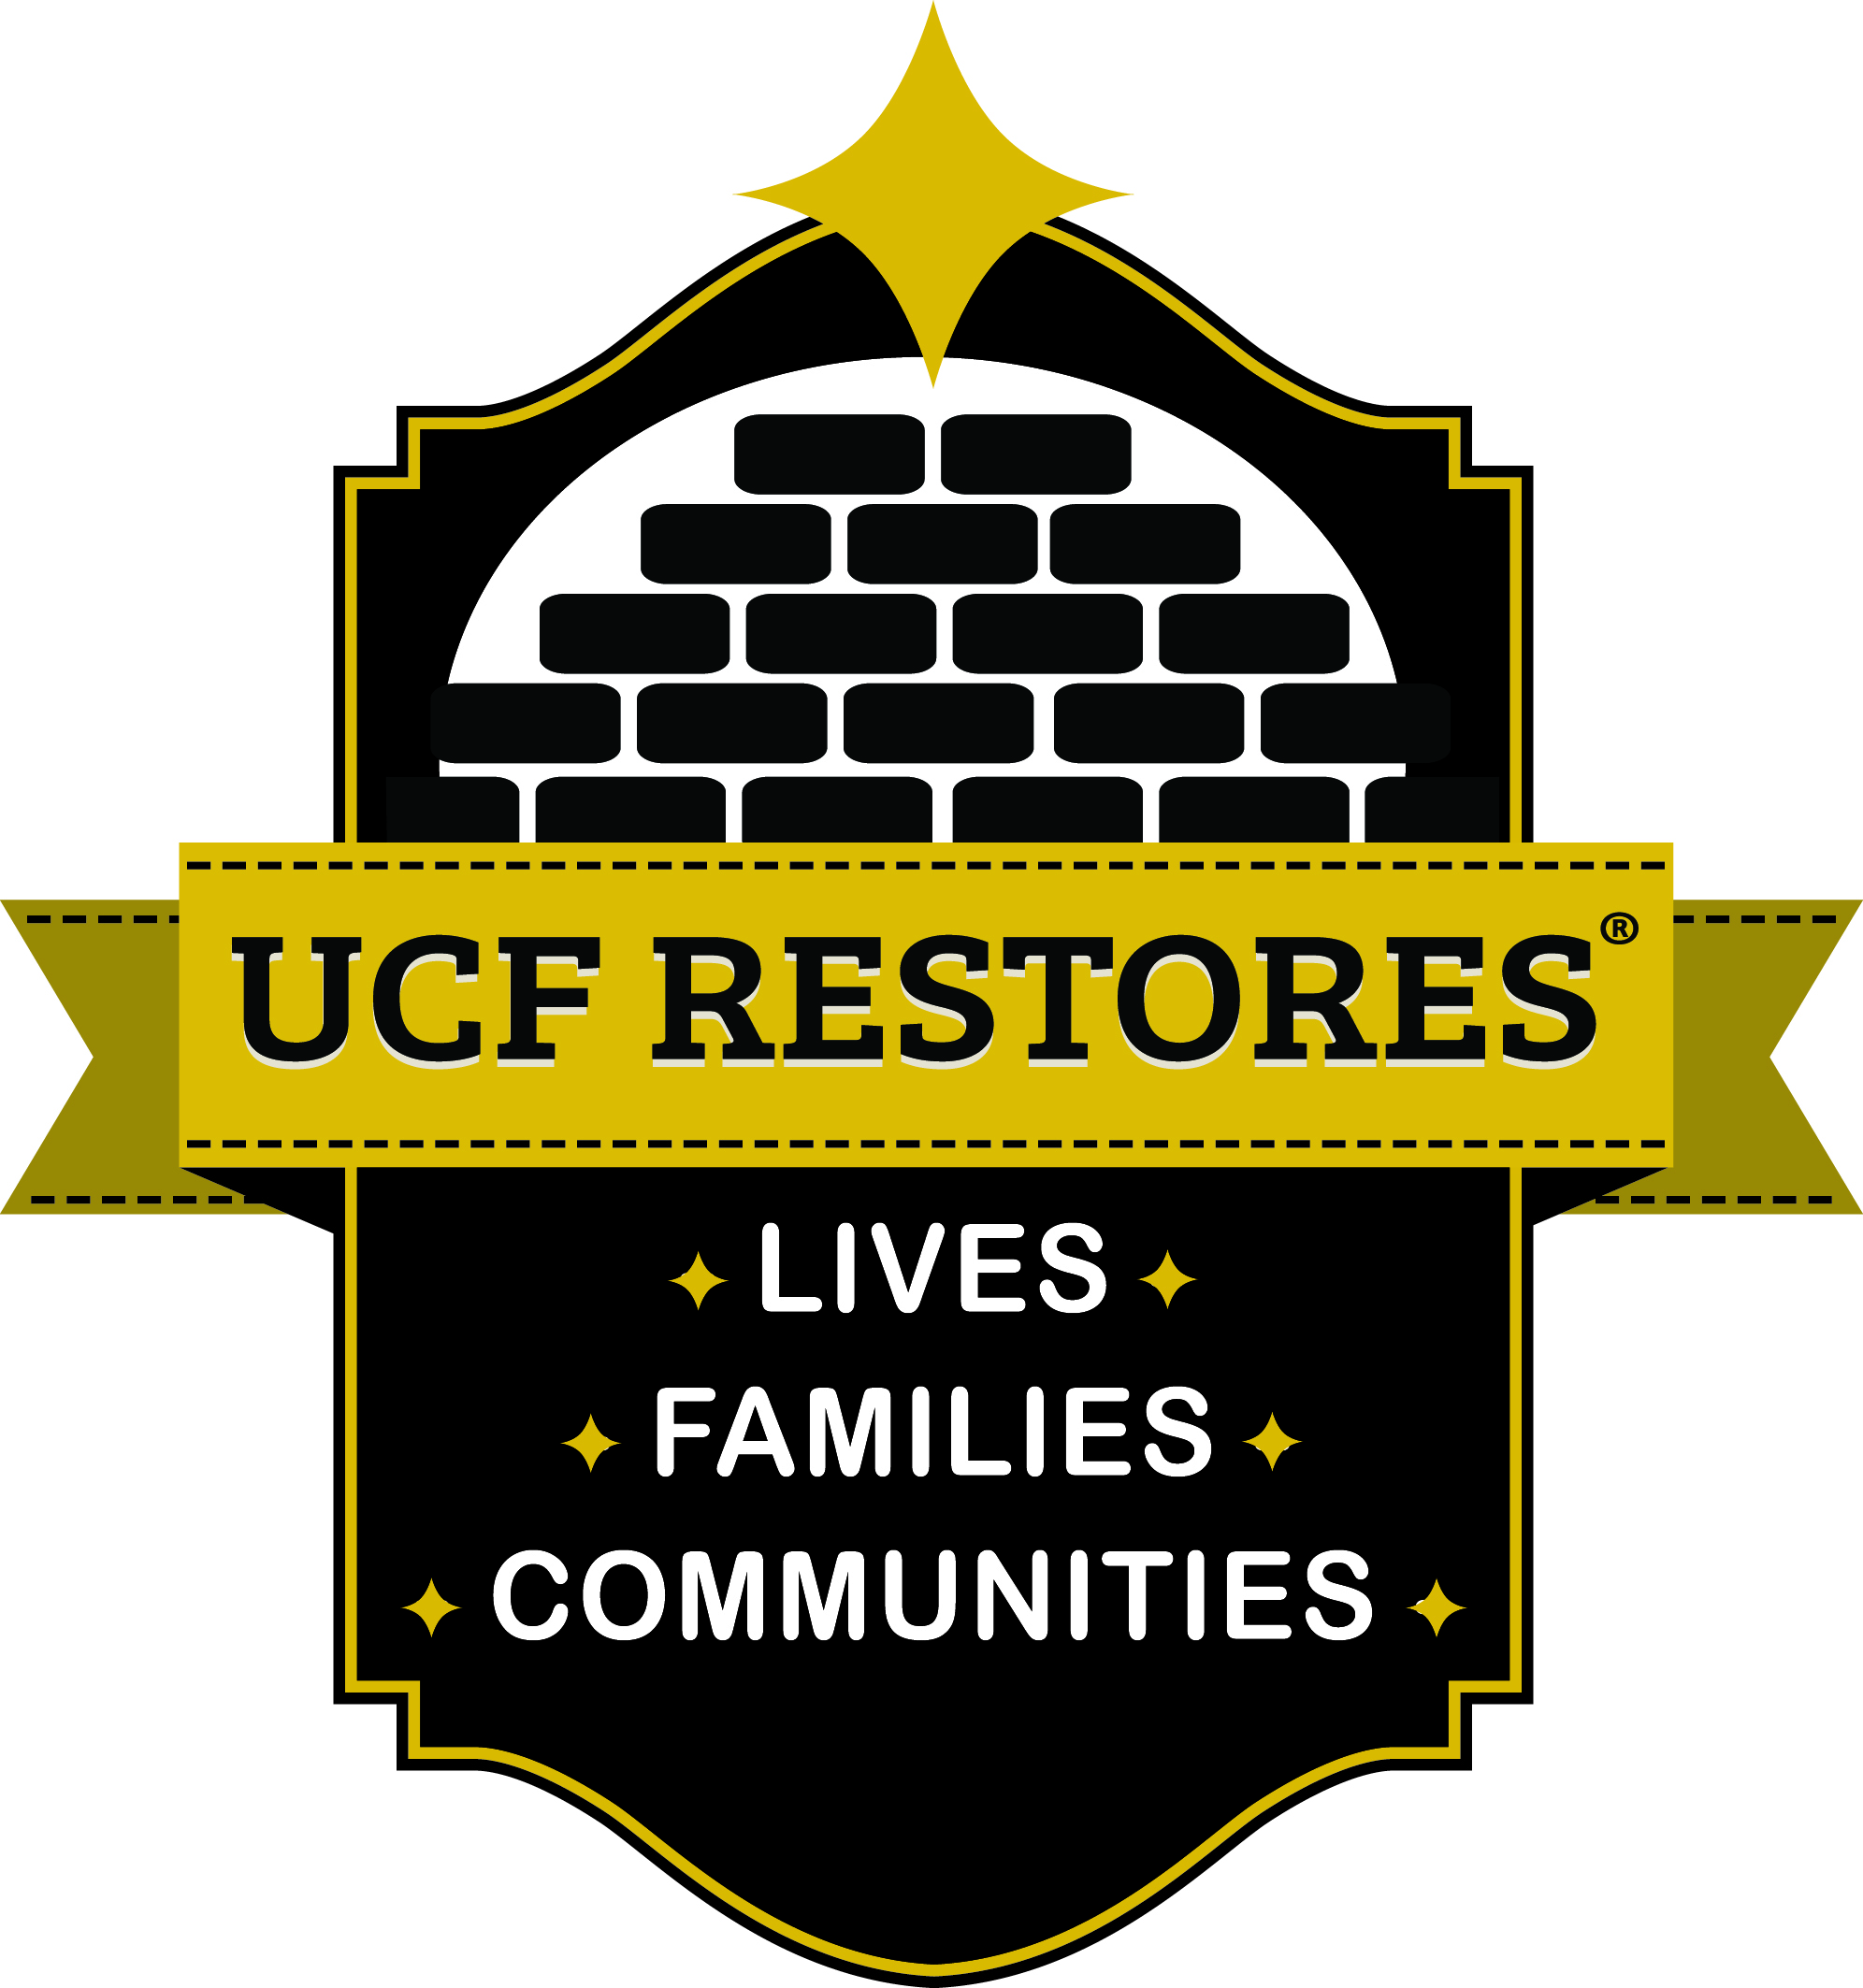 University of Central Florida (UCF RESTORES)